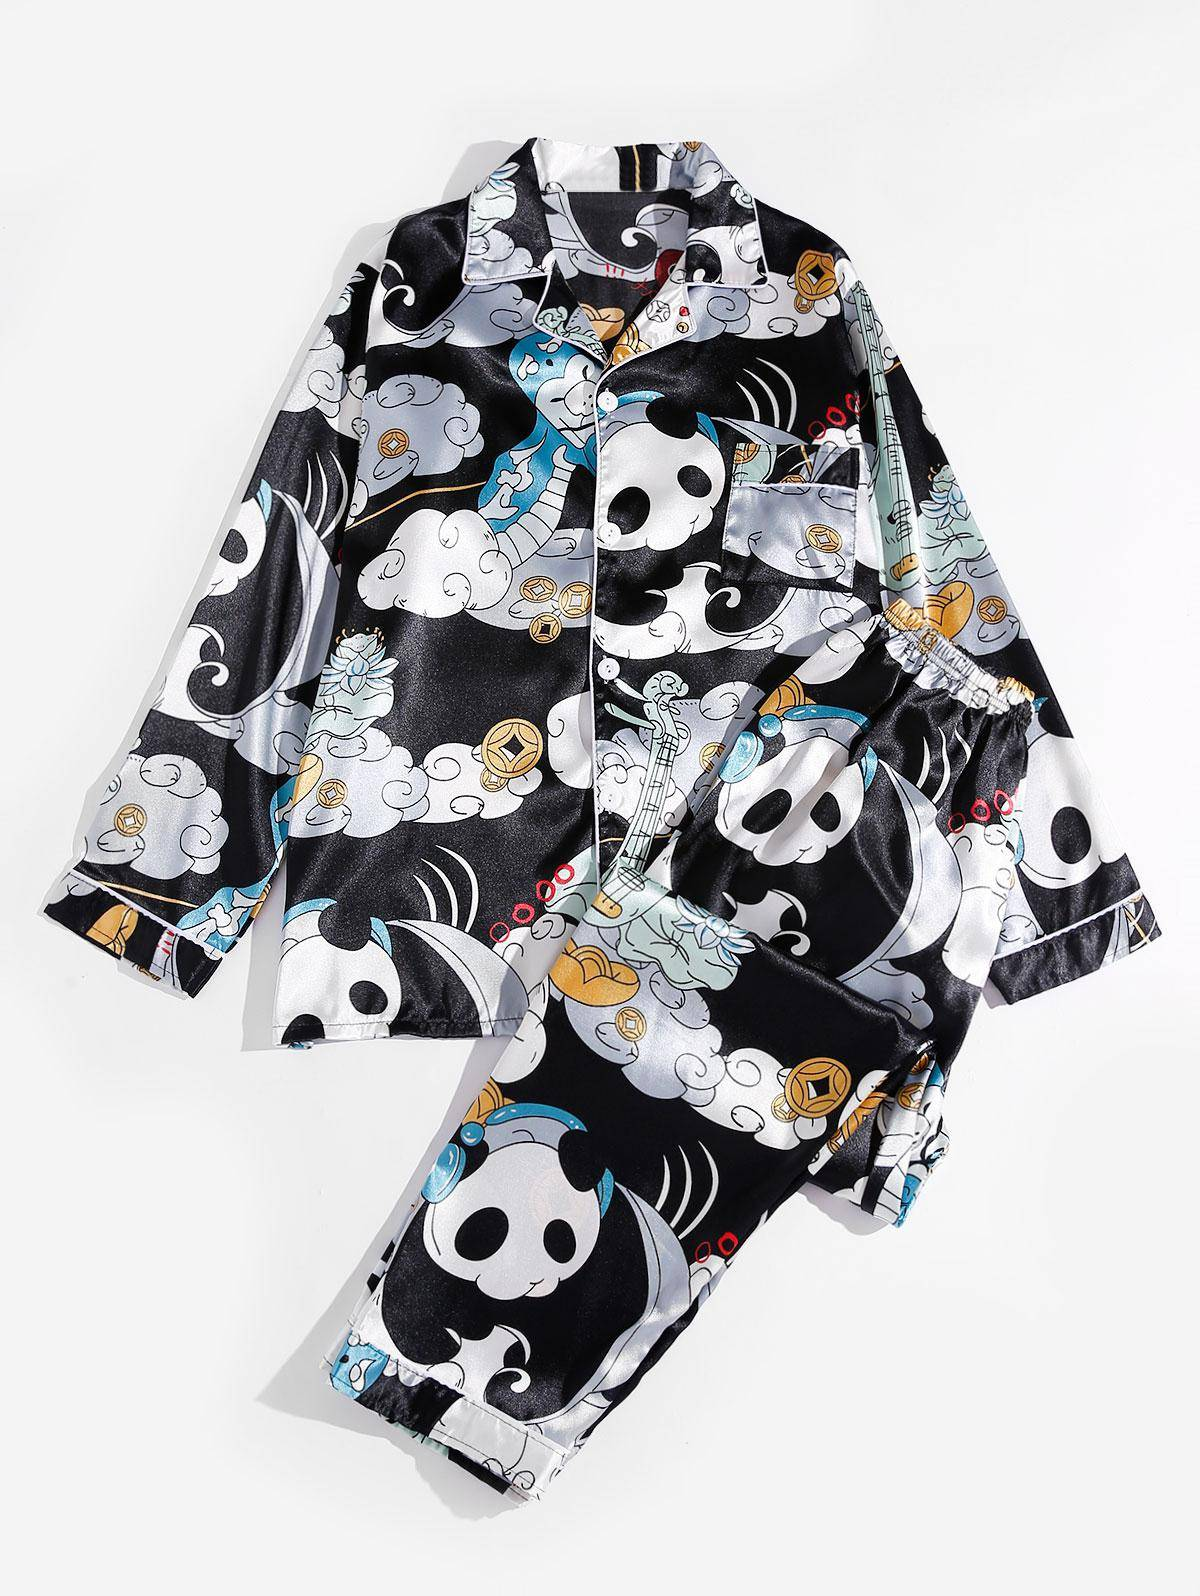 Panda Playing Music Panda Print Graphic Silky Pajama Set in MULTI - Size: Extra Small